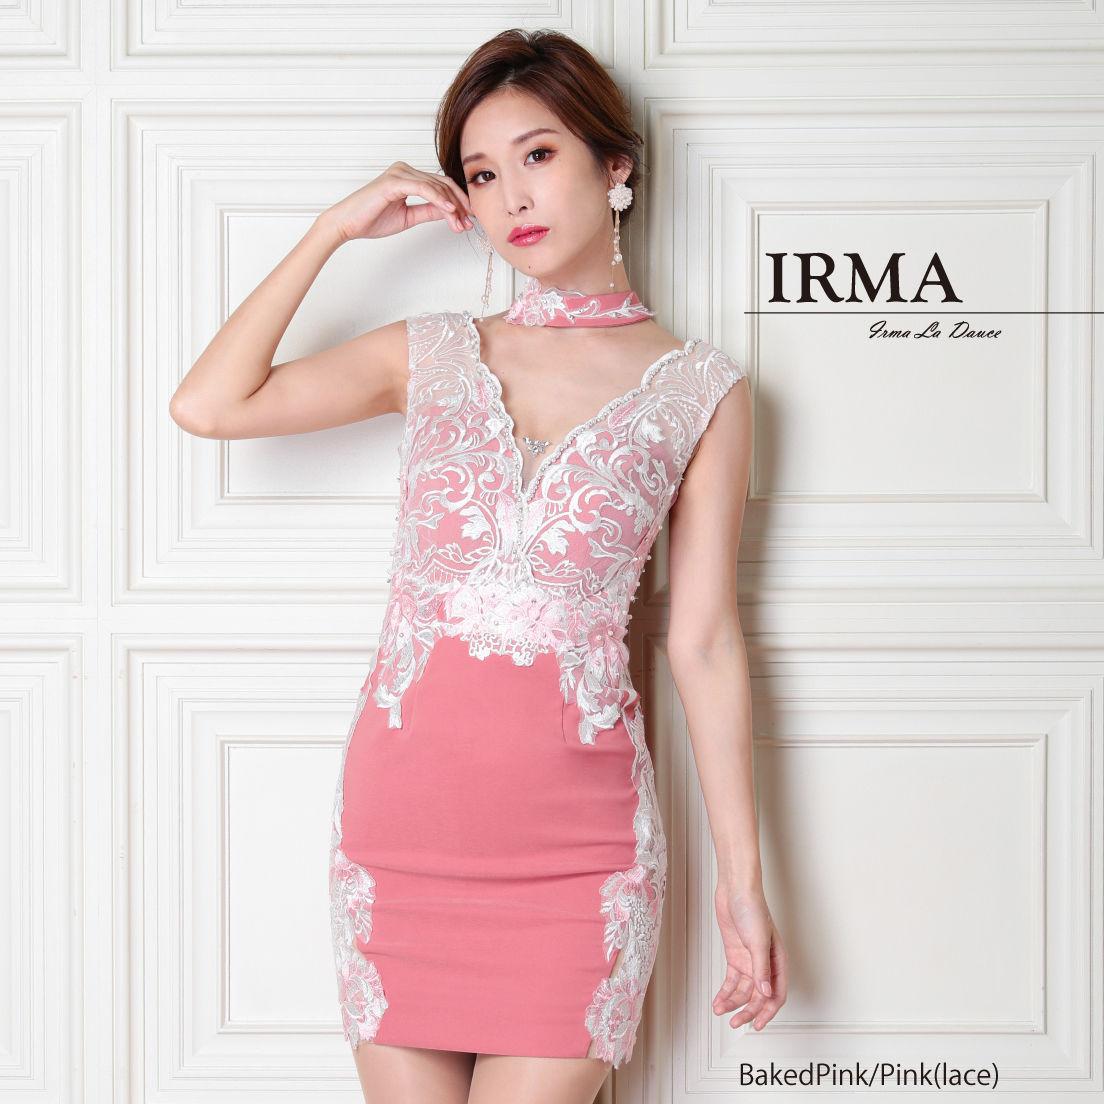 【IRMA】チョーカーフラワーレースタイトミニドレス